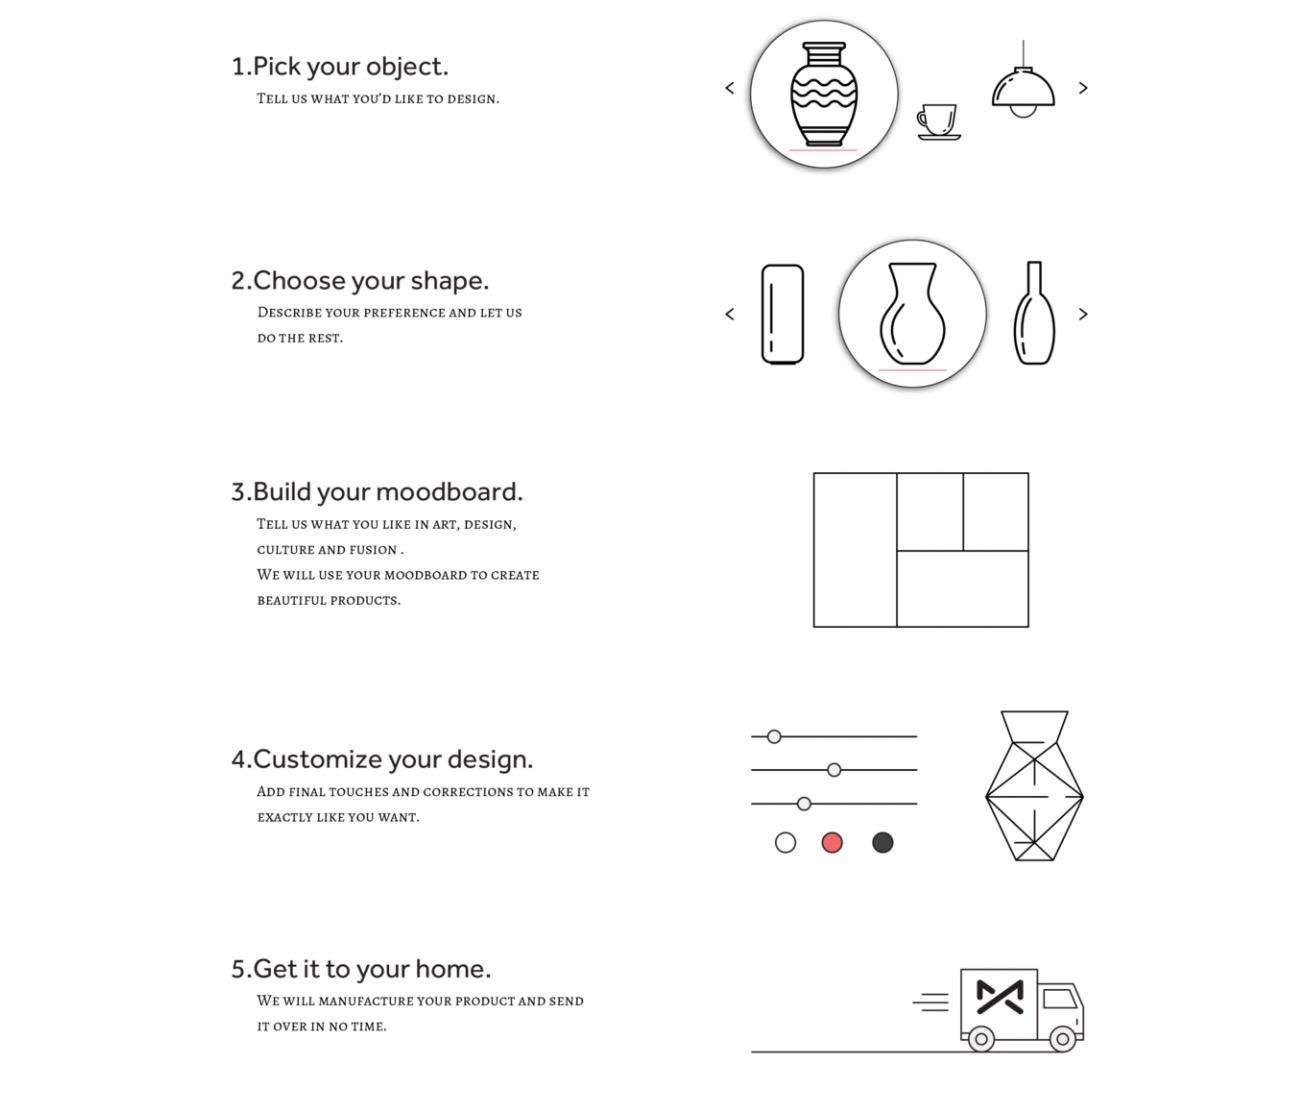 Maix's five-step process